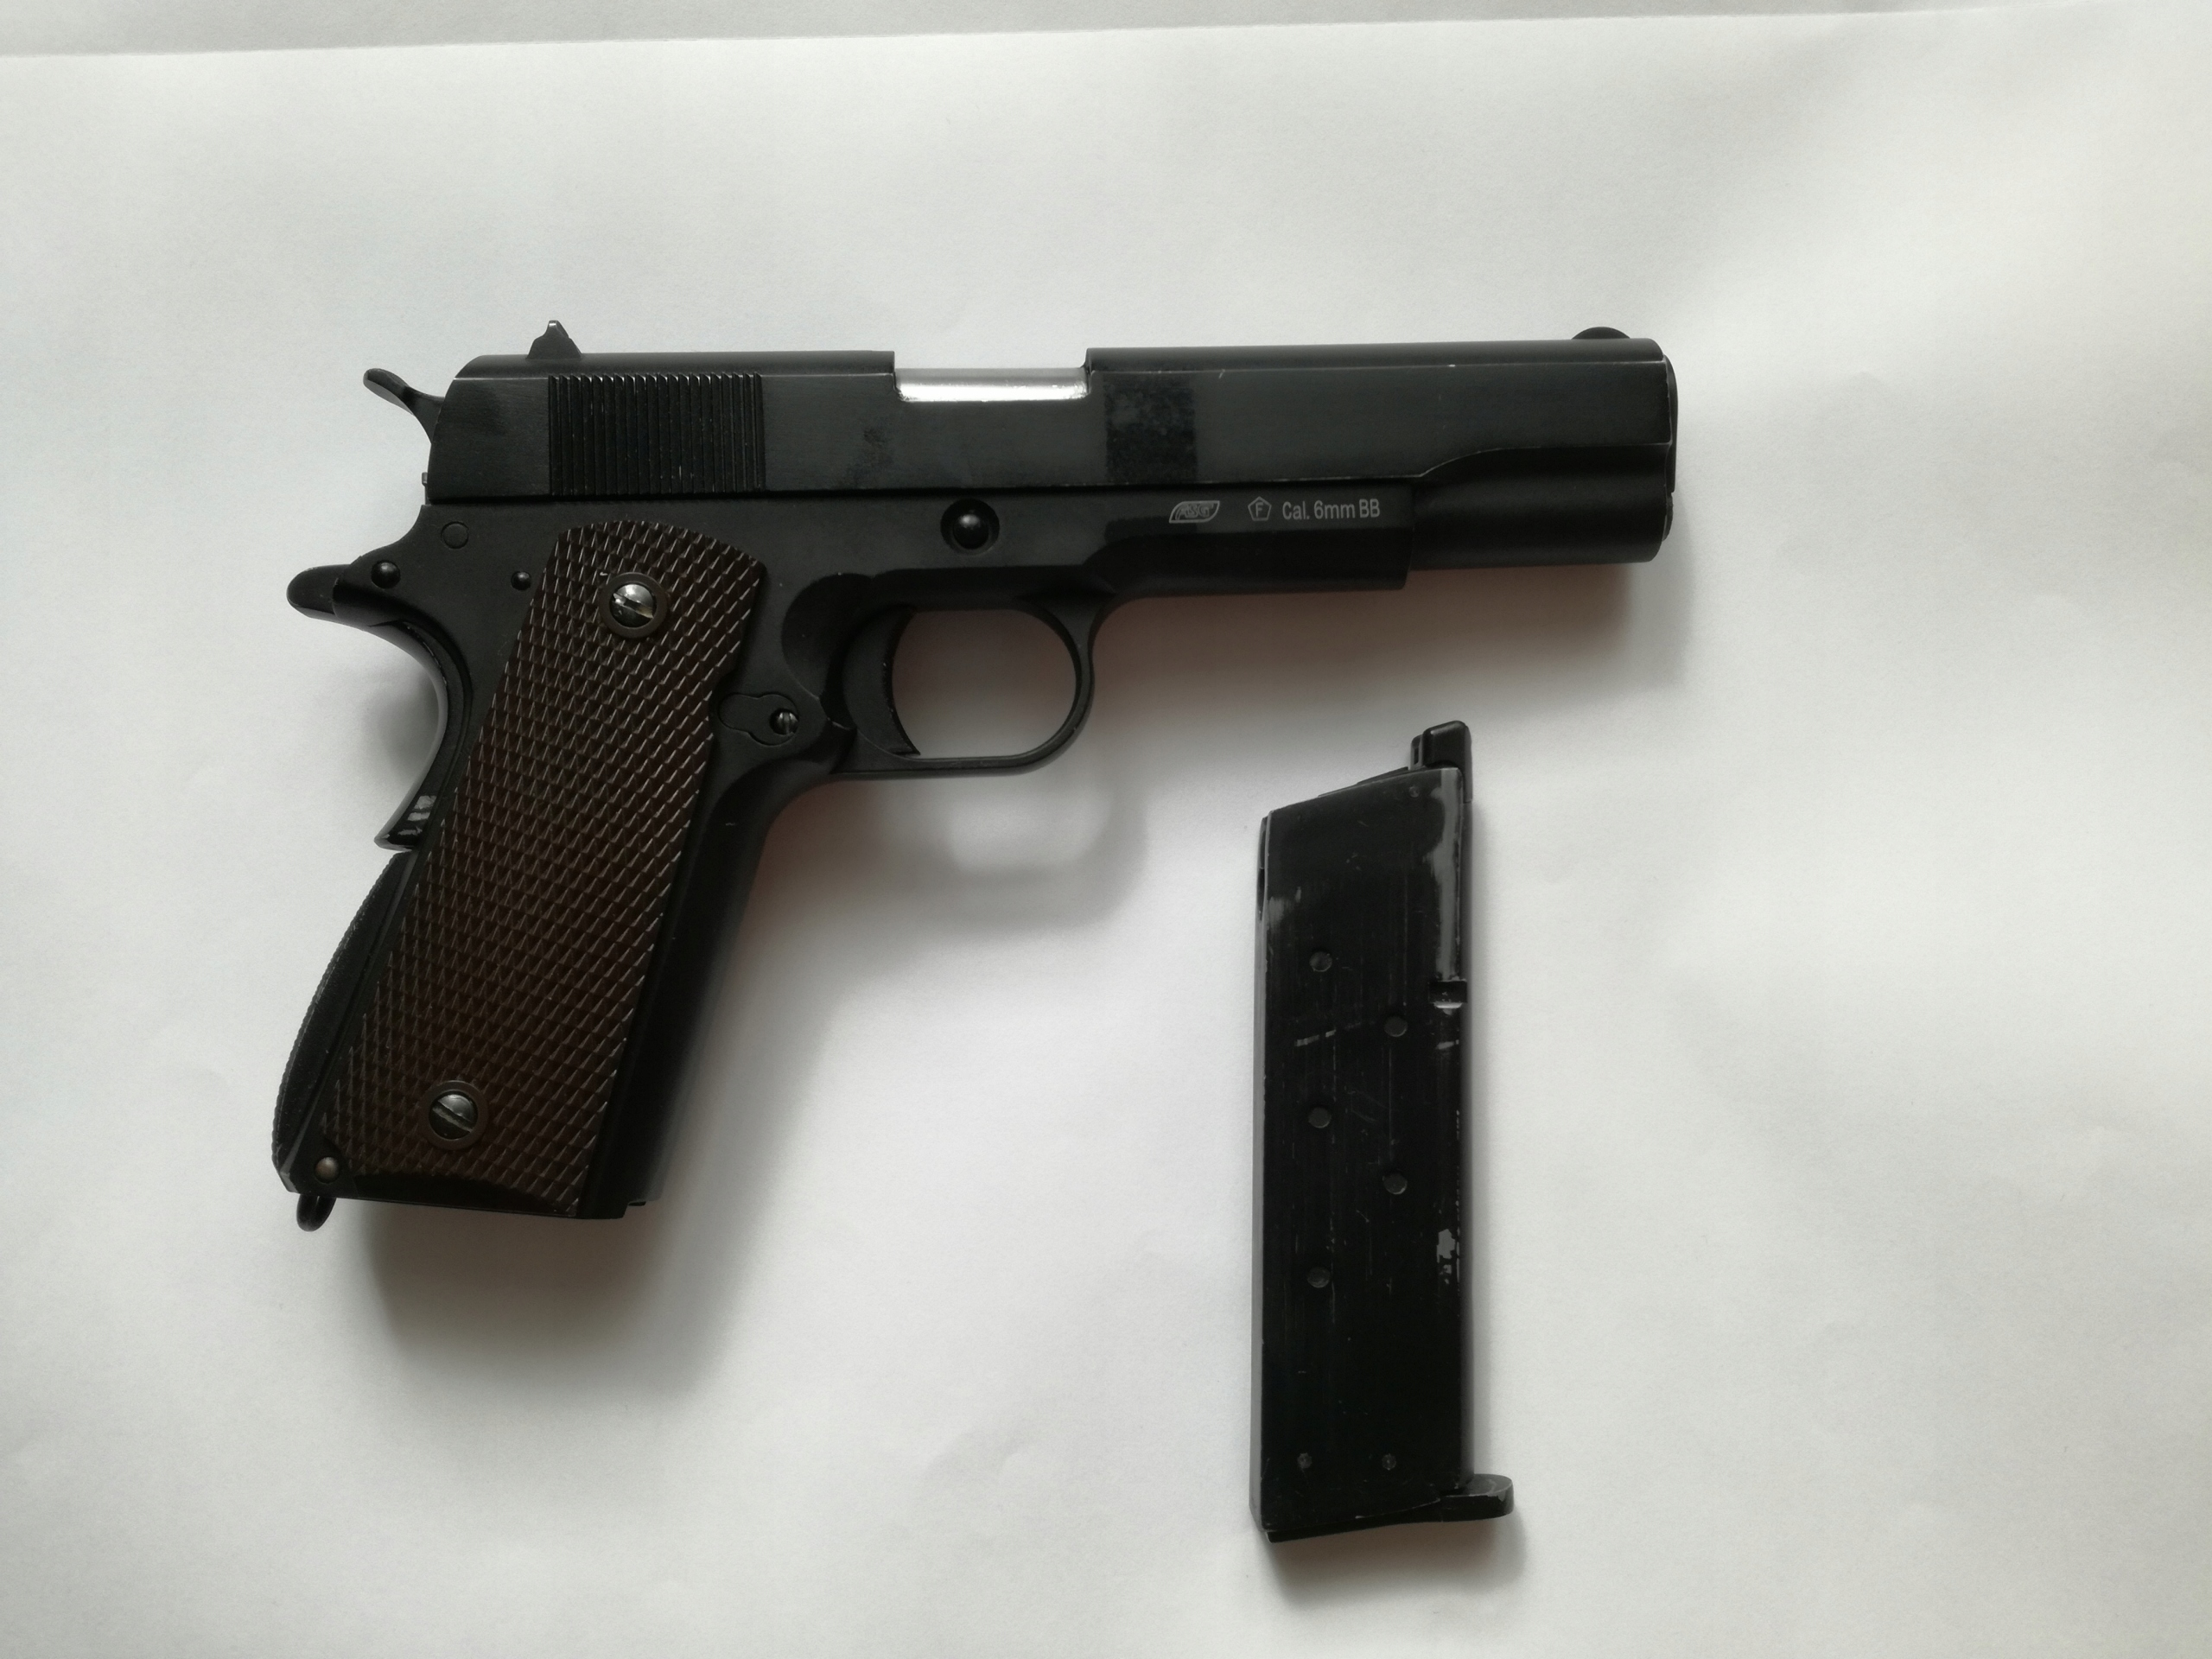 ASG Colt 1911 WE